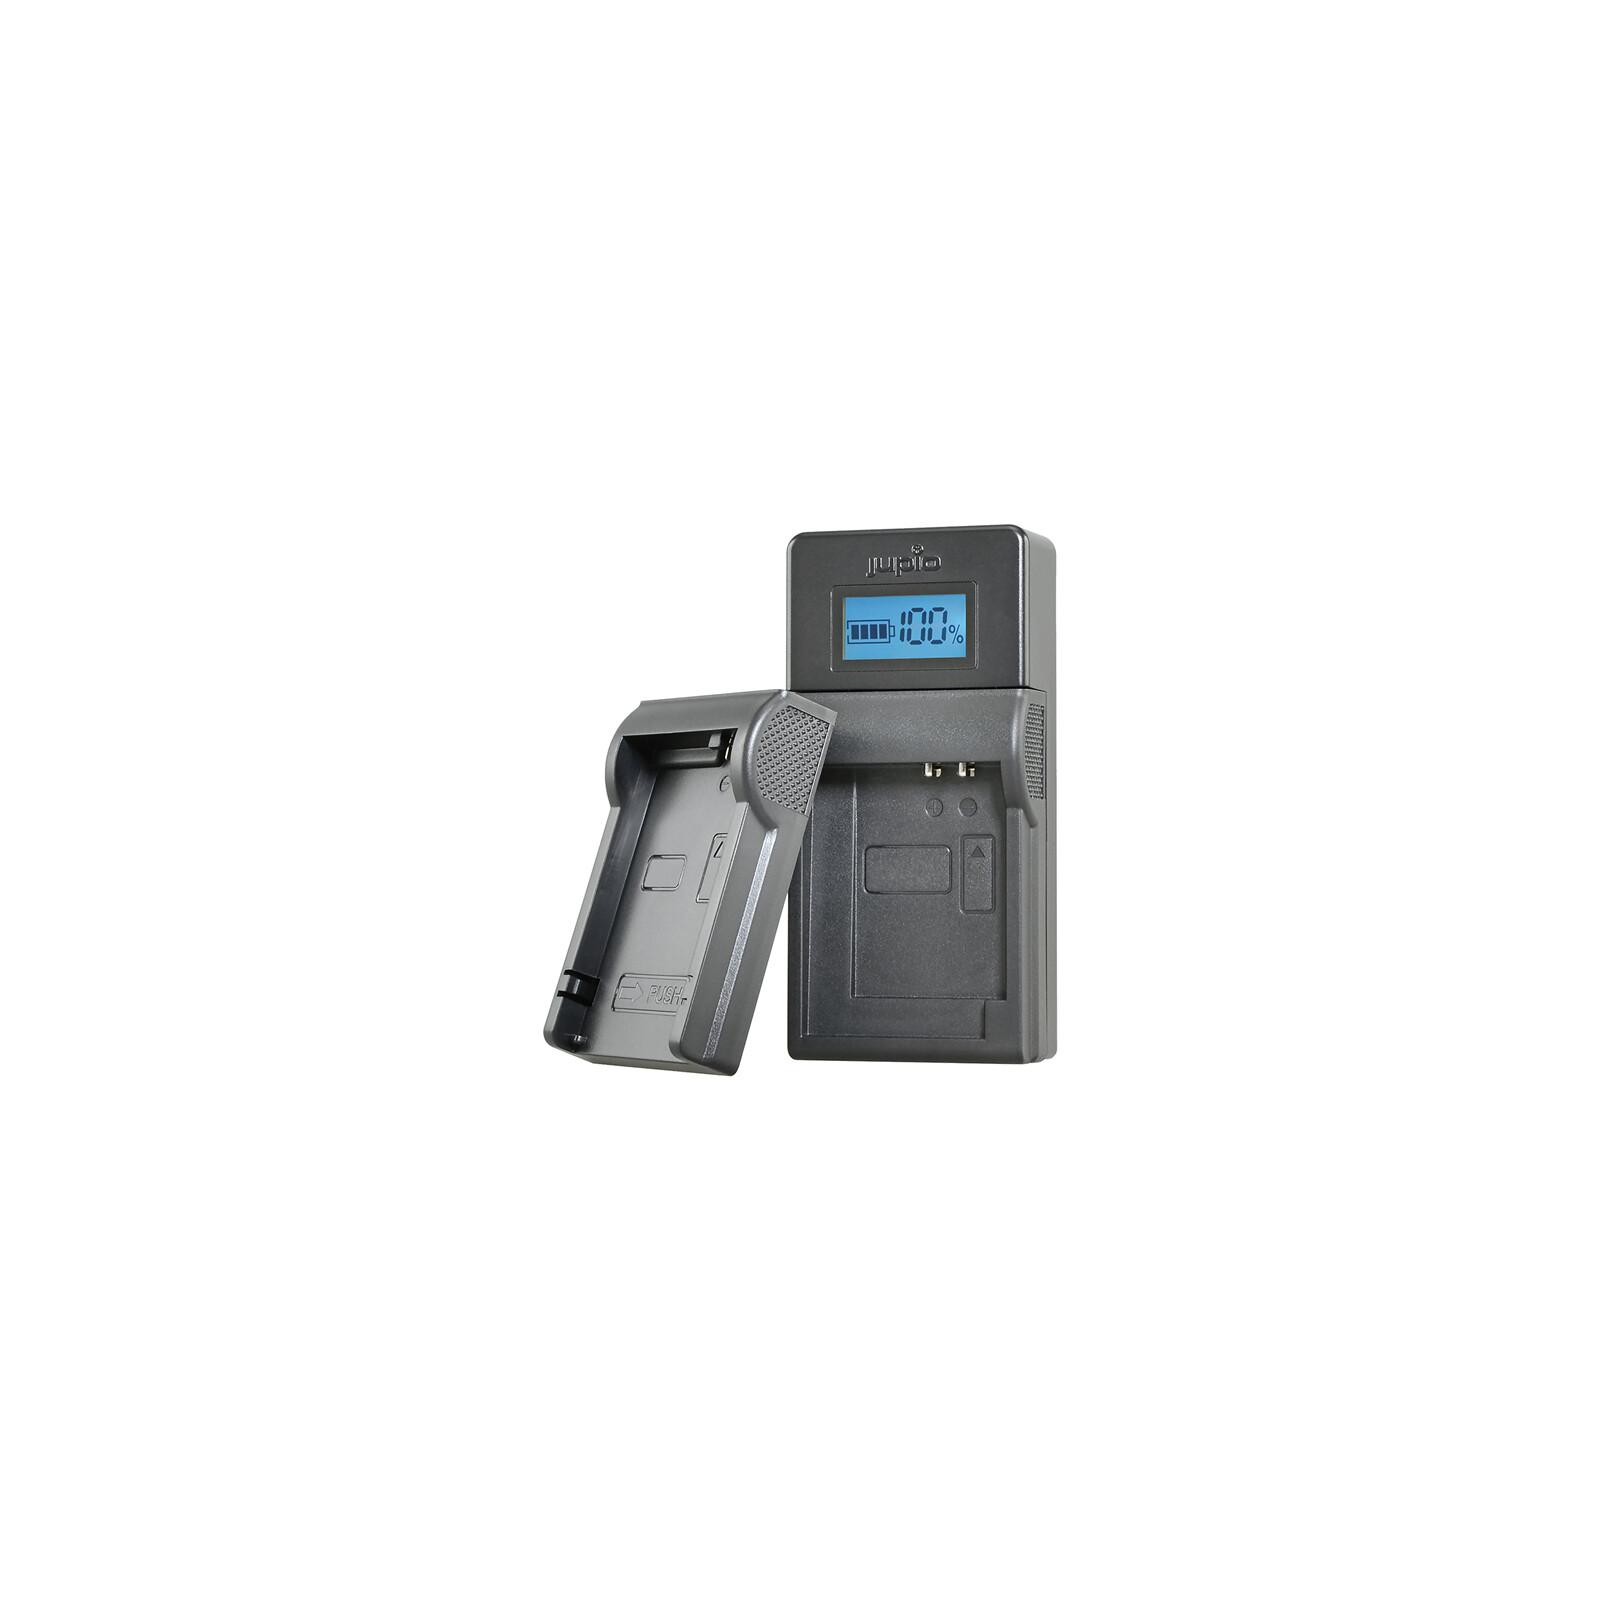 Jupio Brand Charger for Sony, Samsung, JVC 7.2-8.4V